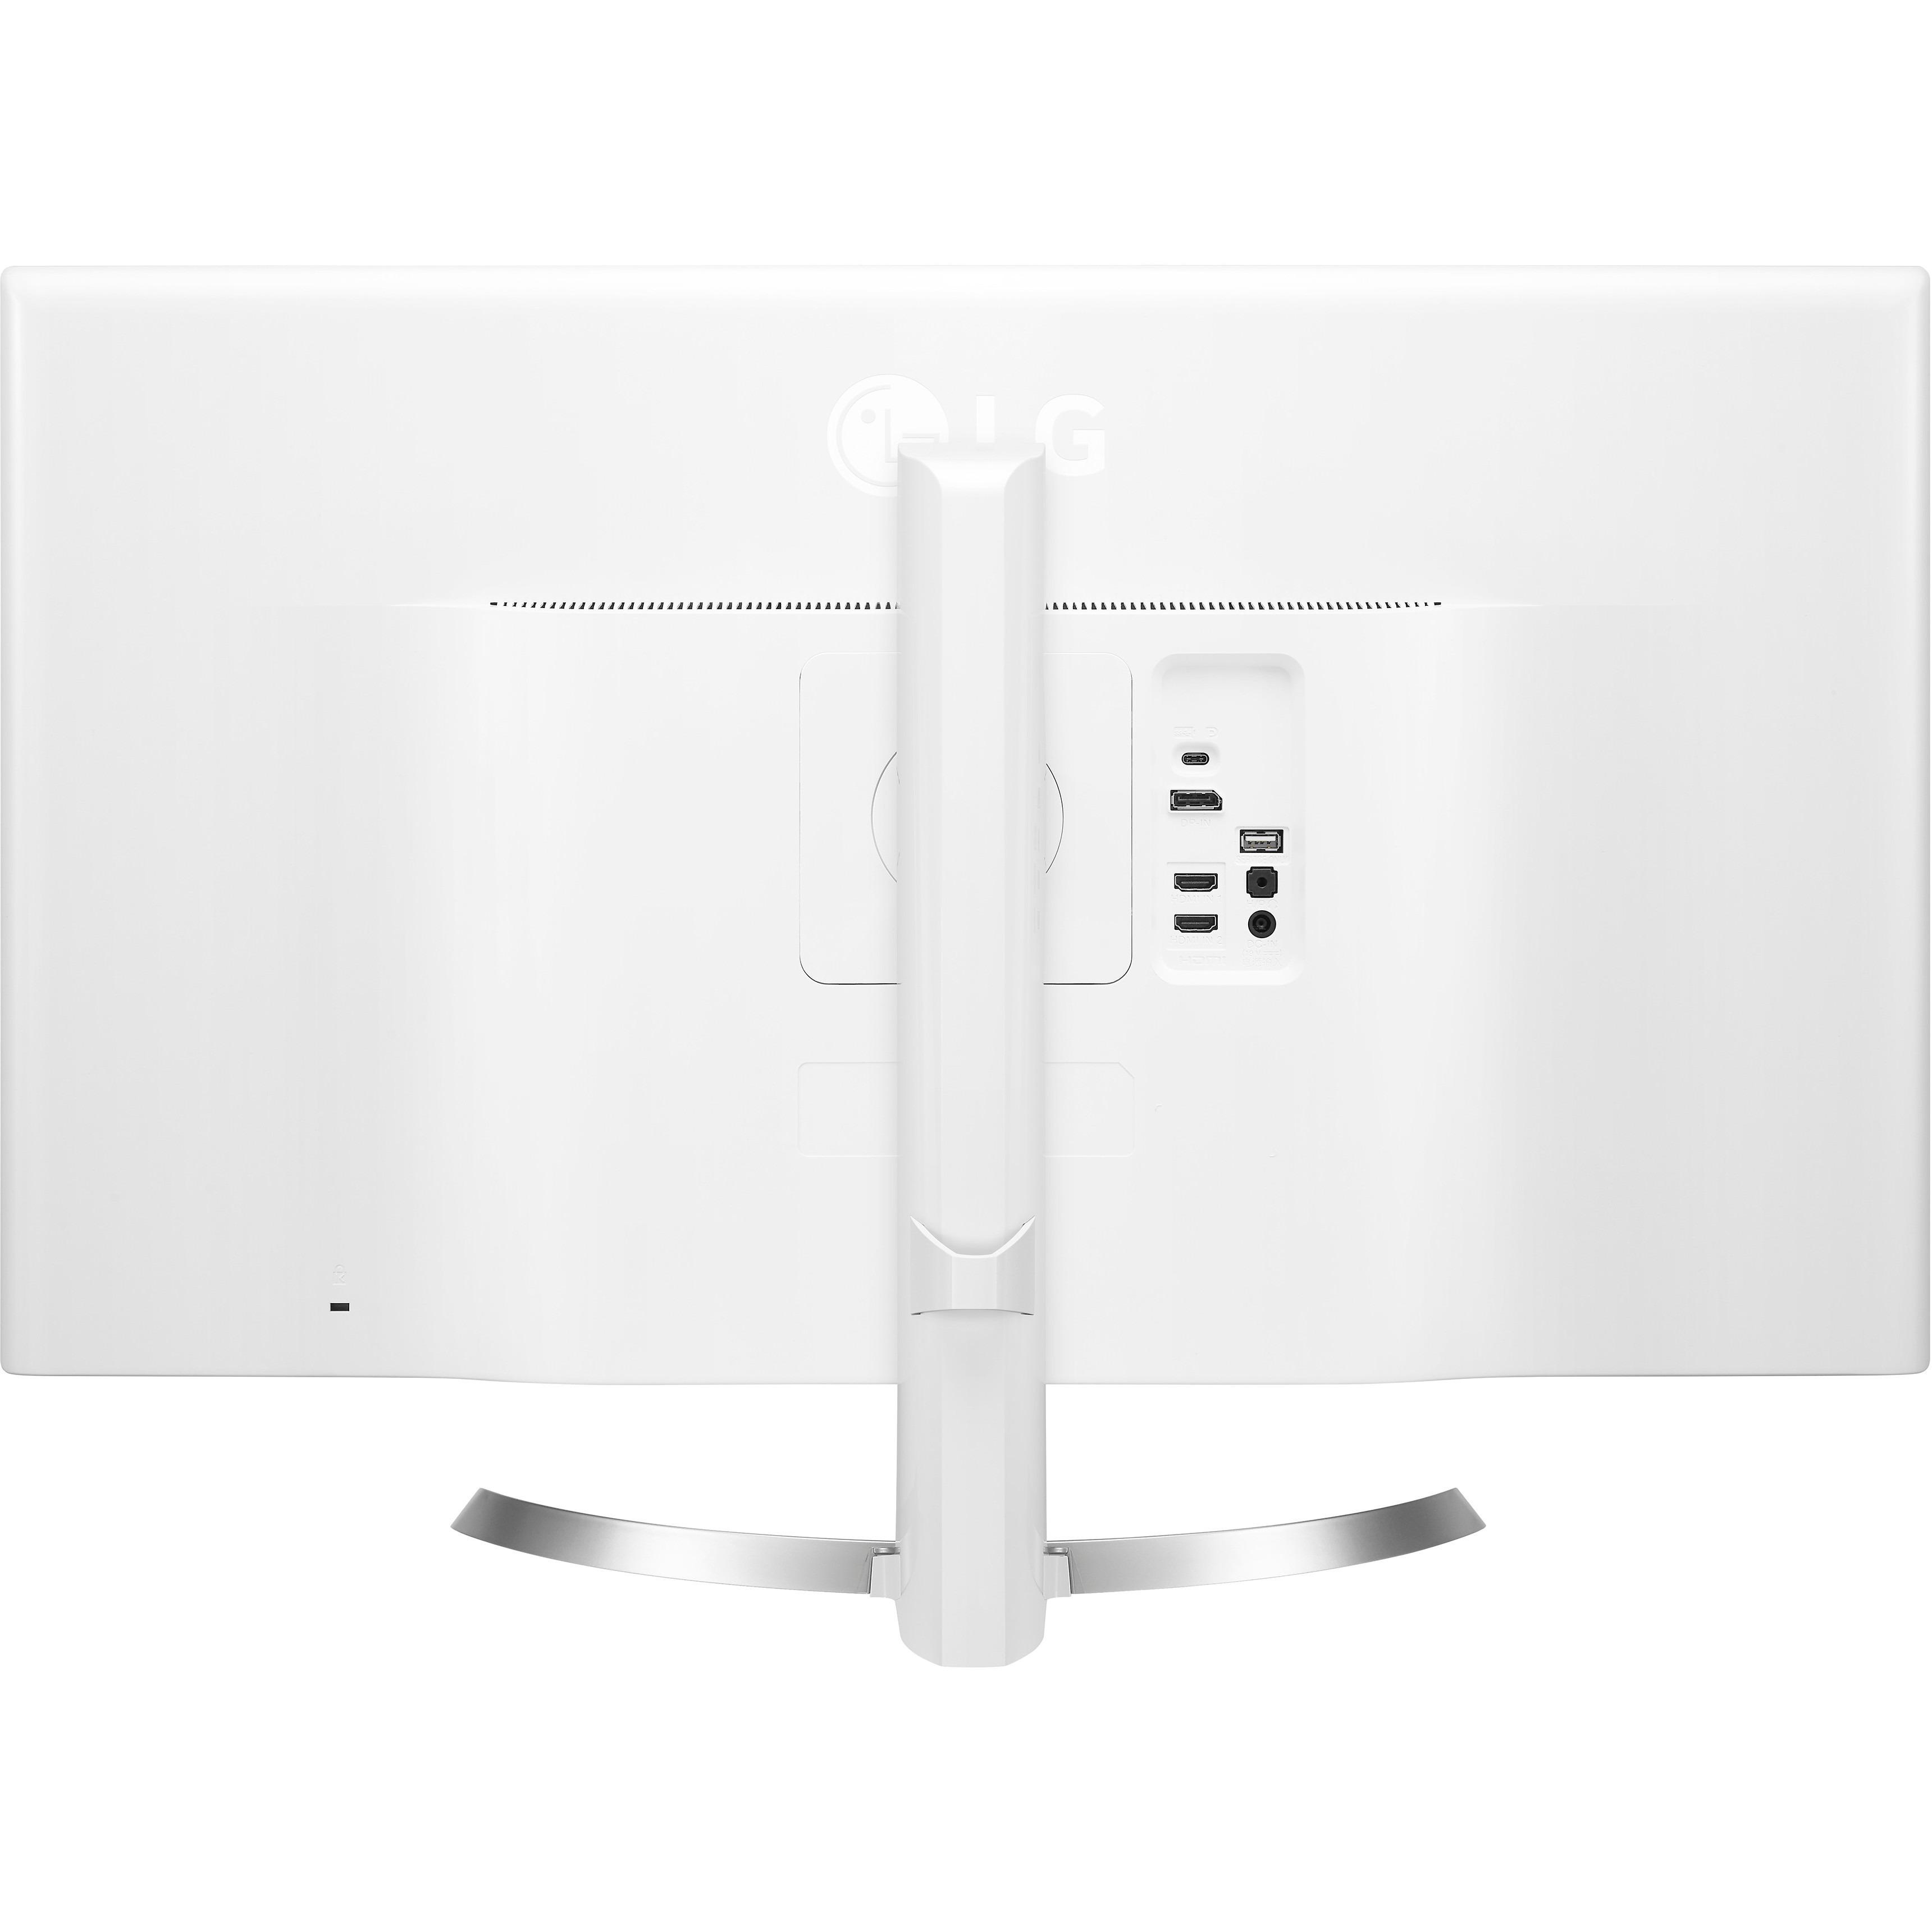 LG 32UD89-W 31.5inch LED LCD Monitor - 16:9 - 5 ms - 3840 x 2160